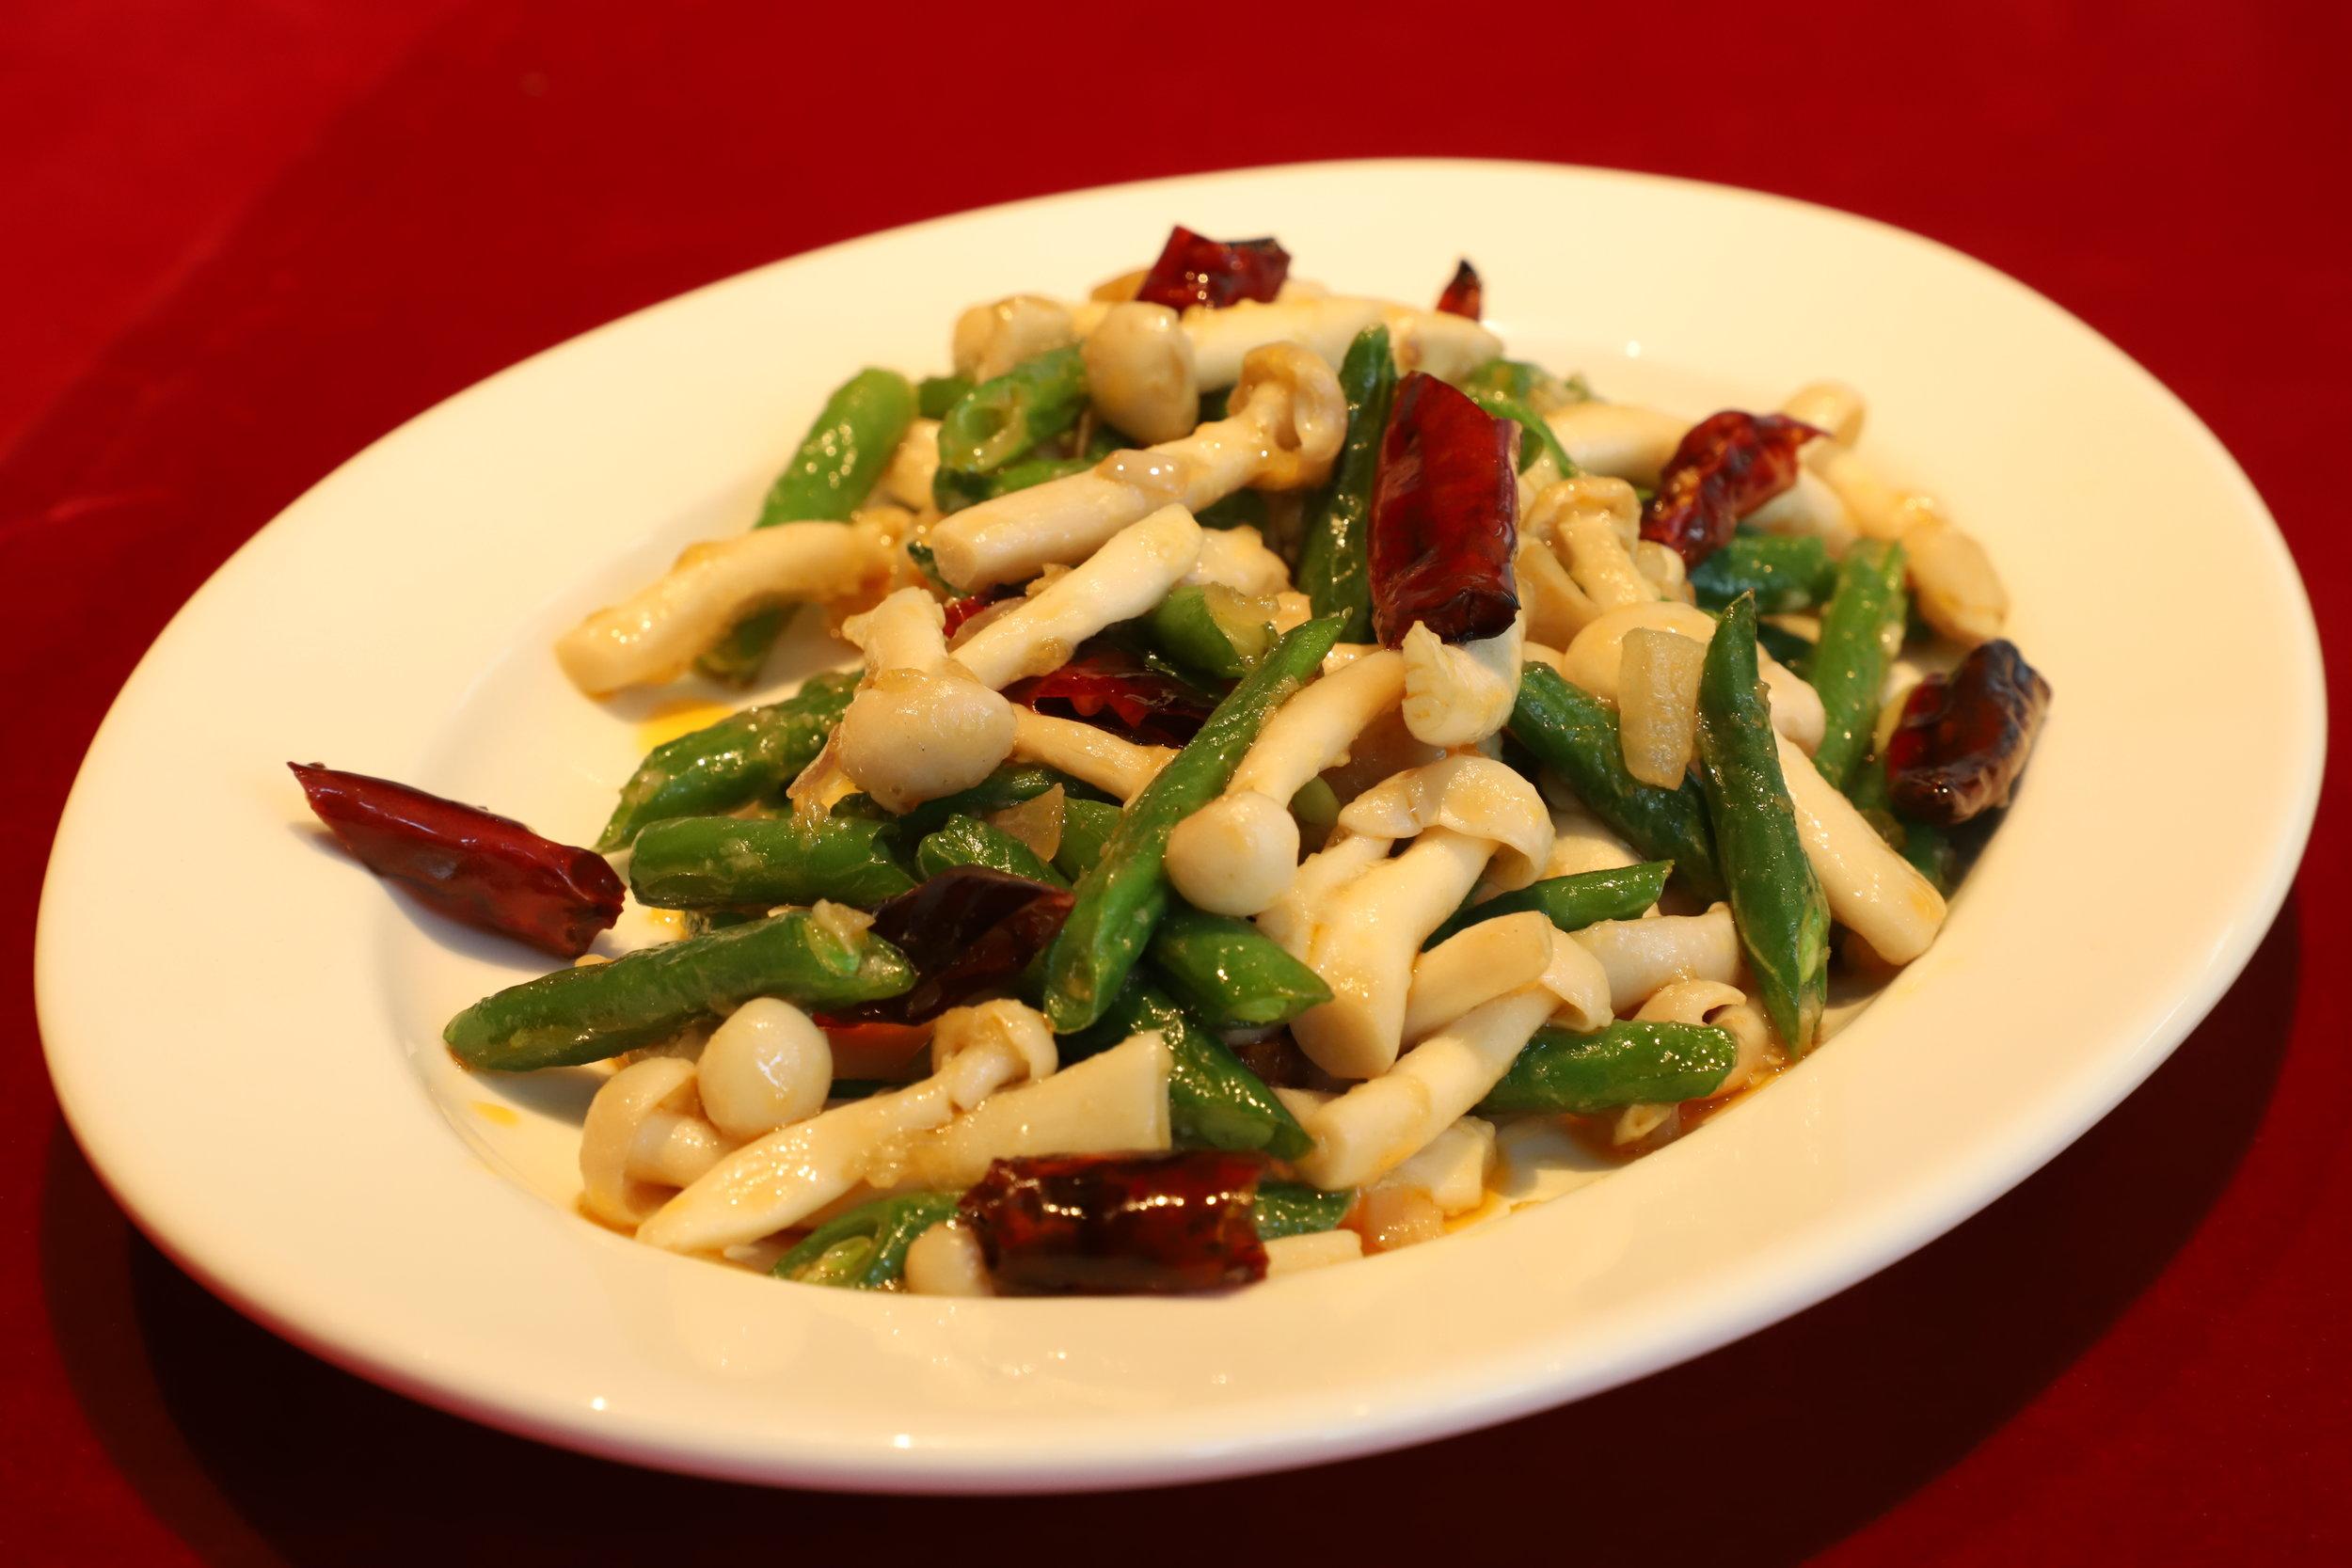 Wok Fried Shimeji Mushrooms, Dry Chilly, Green Beans